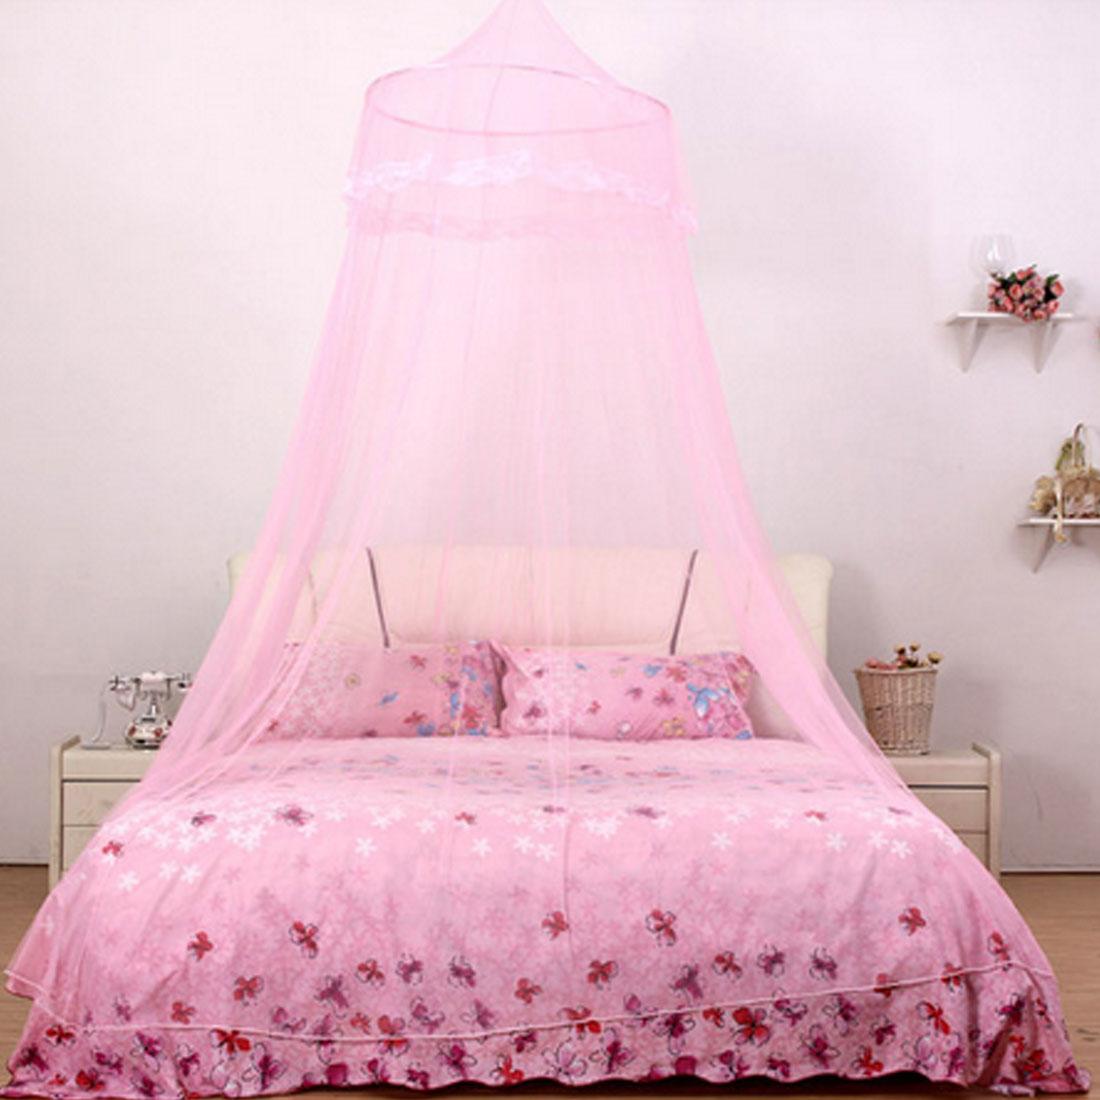 Home Bedroom Round Top Hanging Kit Mesh Bedding Mosquito Net Canopy Fuchsia 210 x 60cm